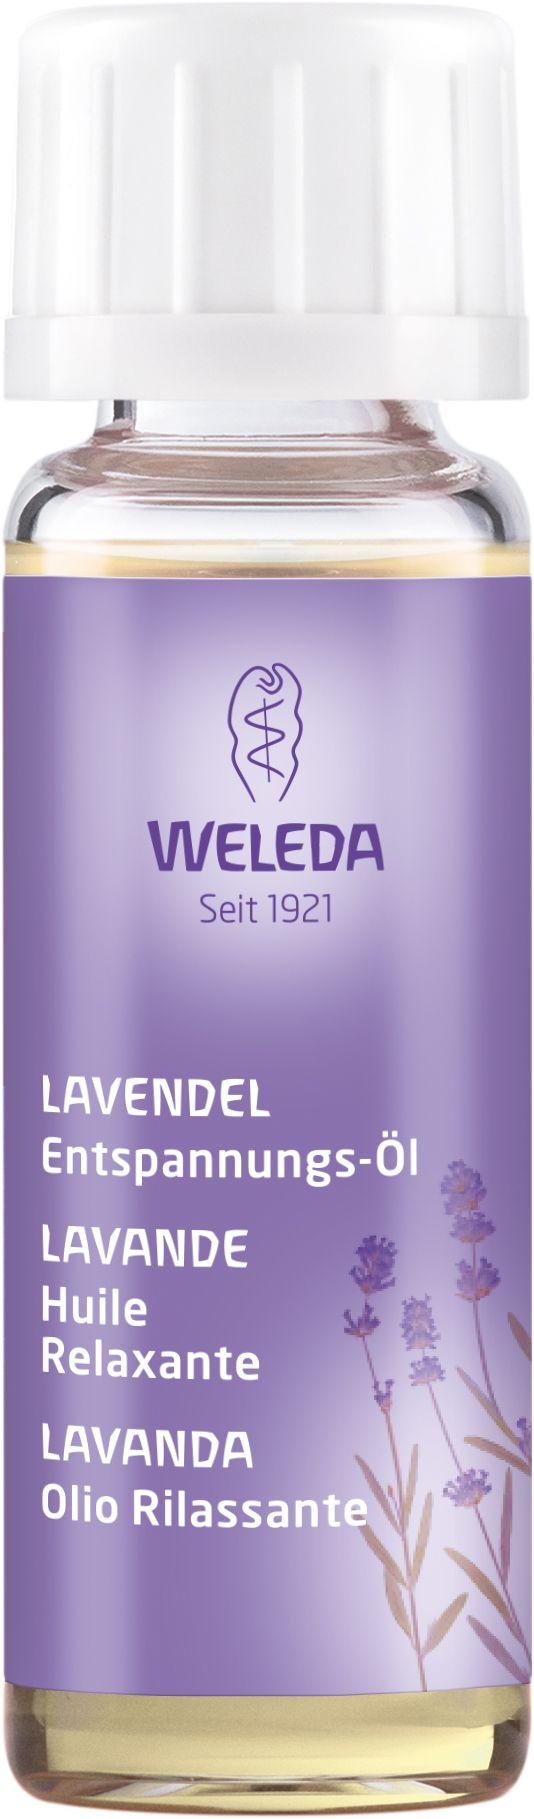 Weleda Lavendel Entspannungs-Öl 10ml